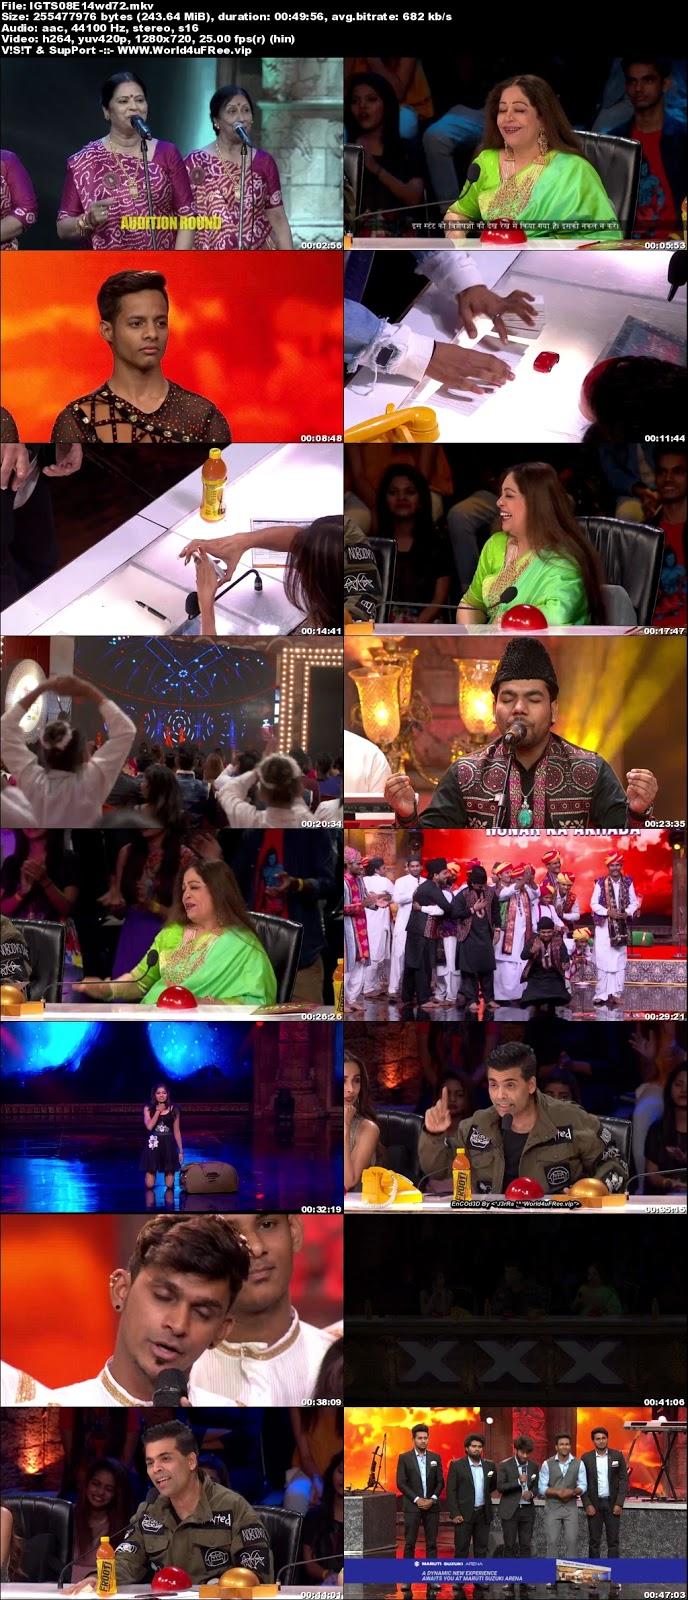 India's Got Talent S08 Episode 14 720p WEBRip 250mb x264 world4ufree.viptv show India's Got Talent Season 8 Star Plus tv show HD 720p free download or watch online at world4ufree.vip